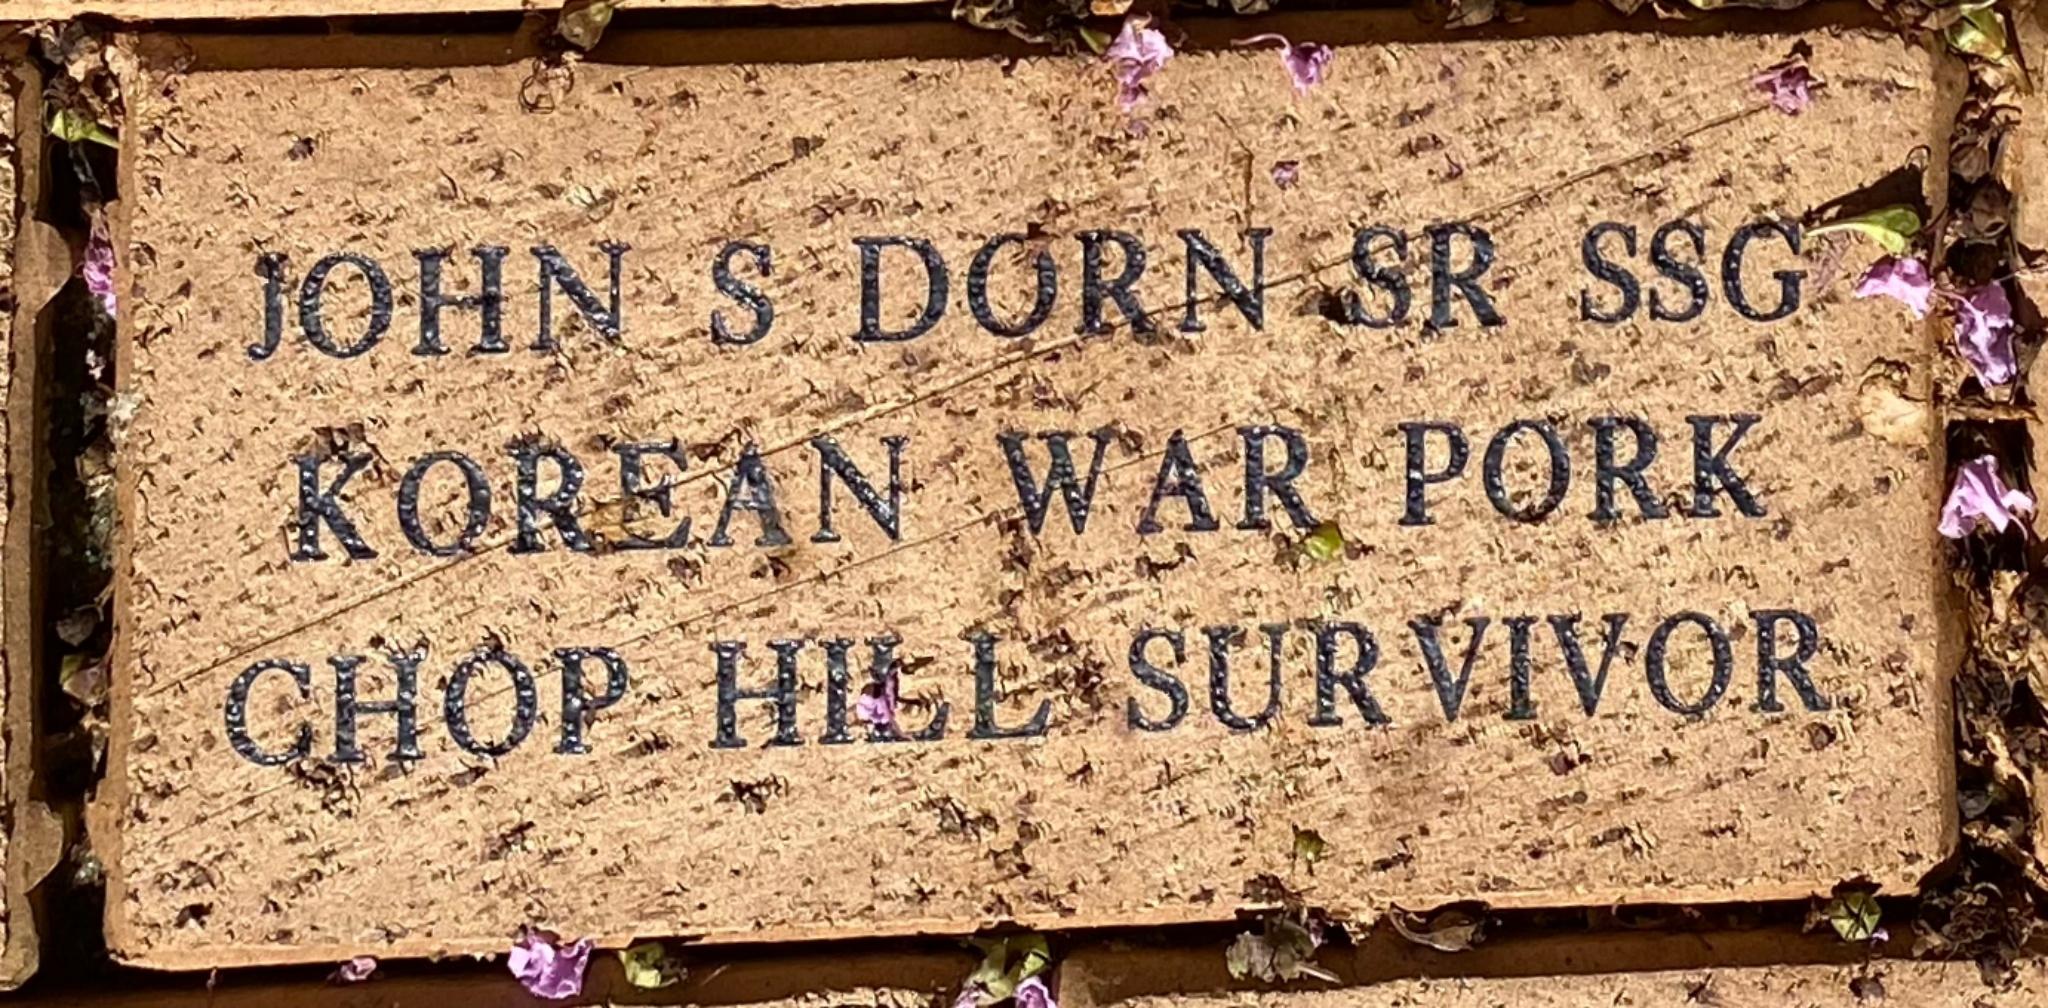 JOHN S DORN SR SSG KOREAN WAR PORK CHOP HILL SURVIVOR